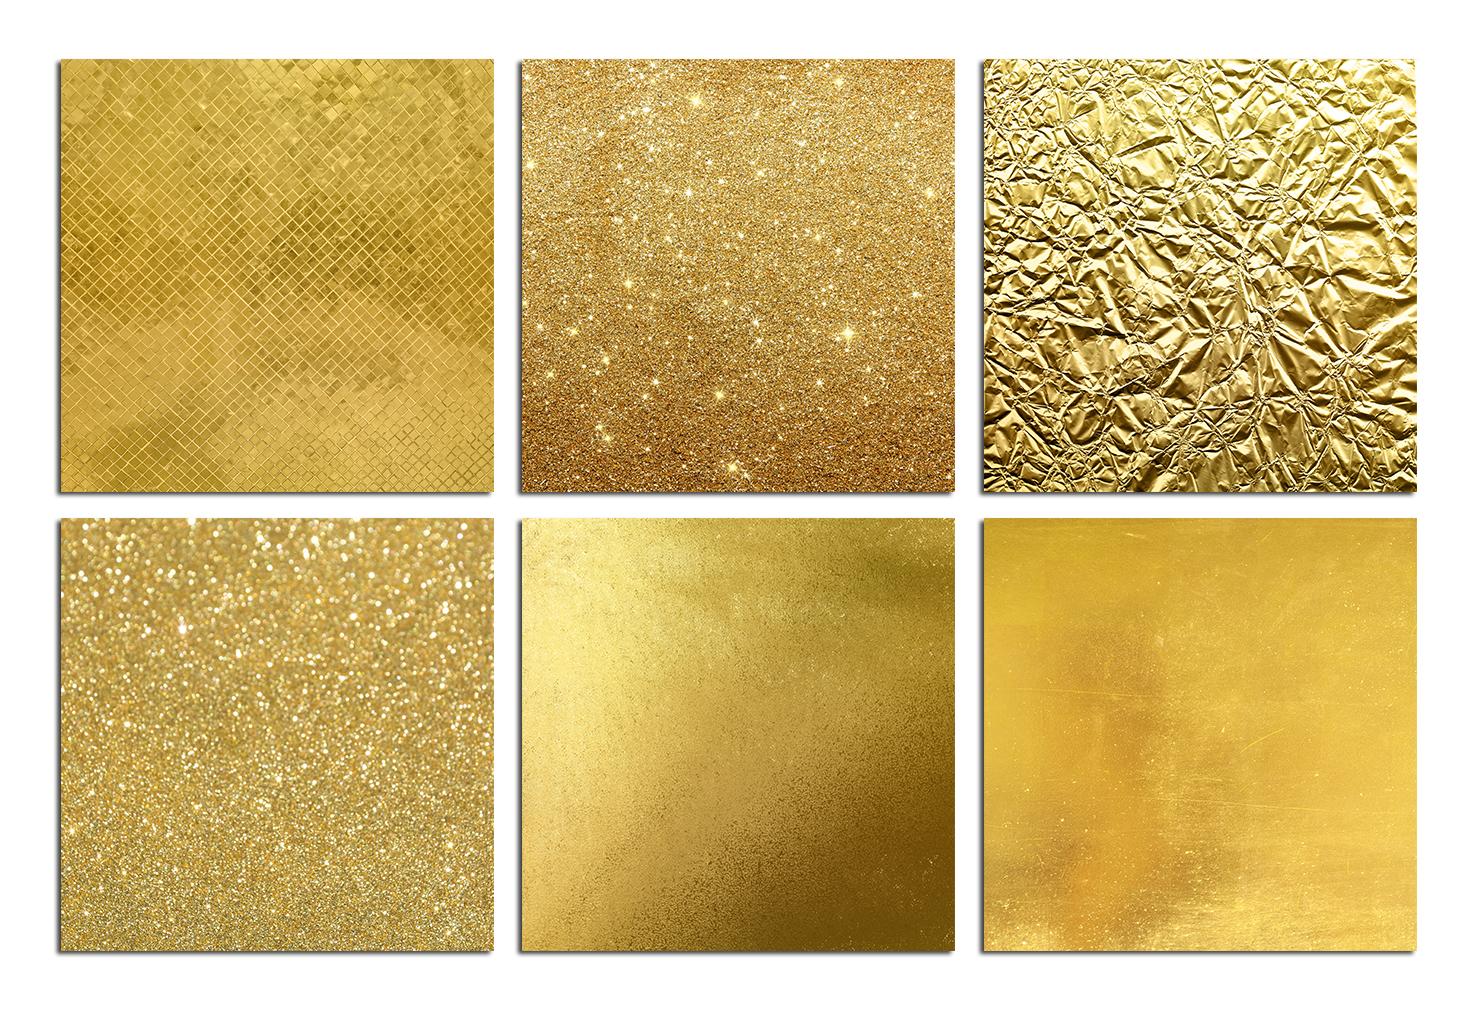 Gold Foil & Glitter Digital Paper example image 2